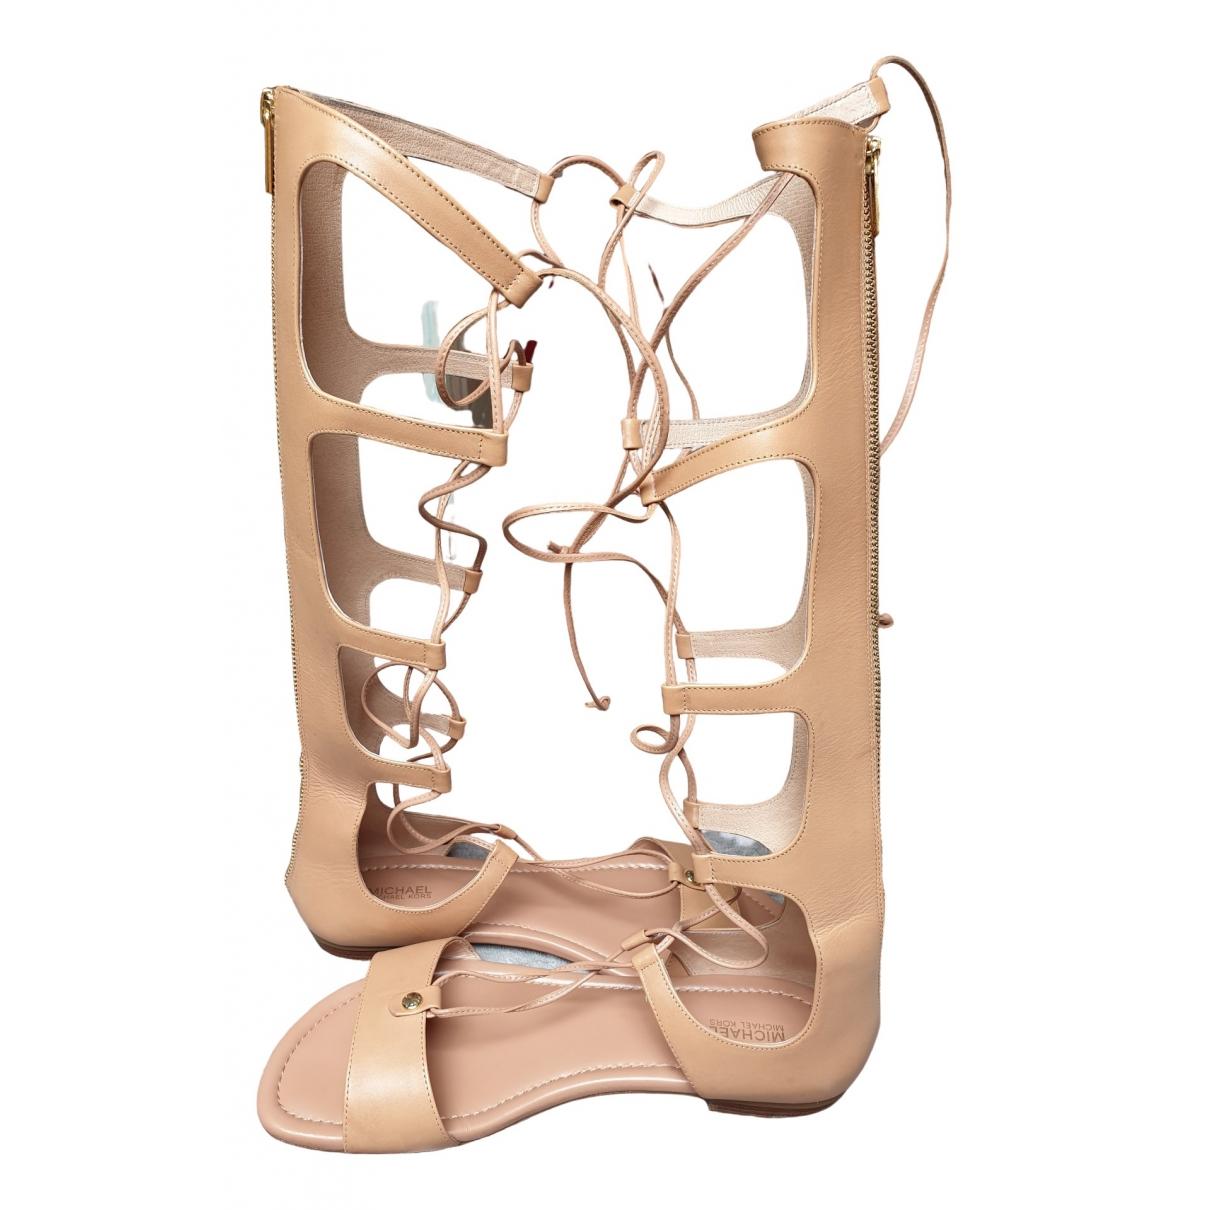 Michael Kors \N Beige Leather Sandals for Women 41 EU